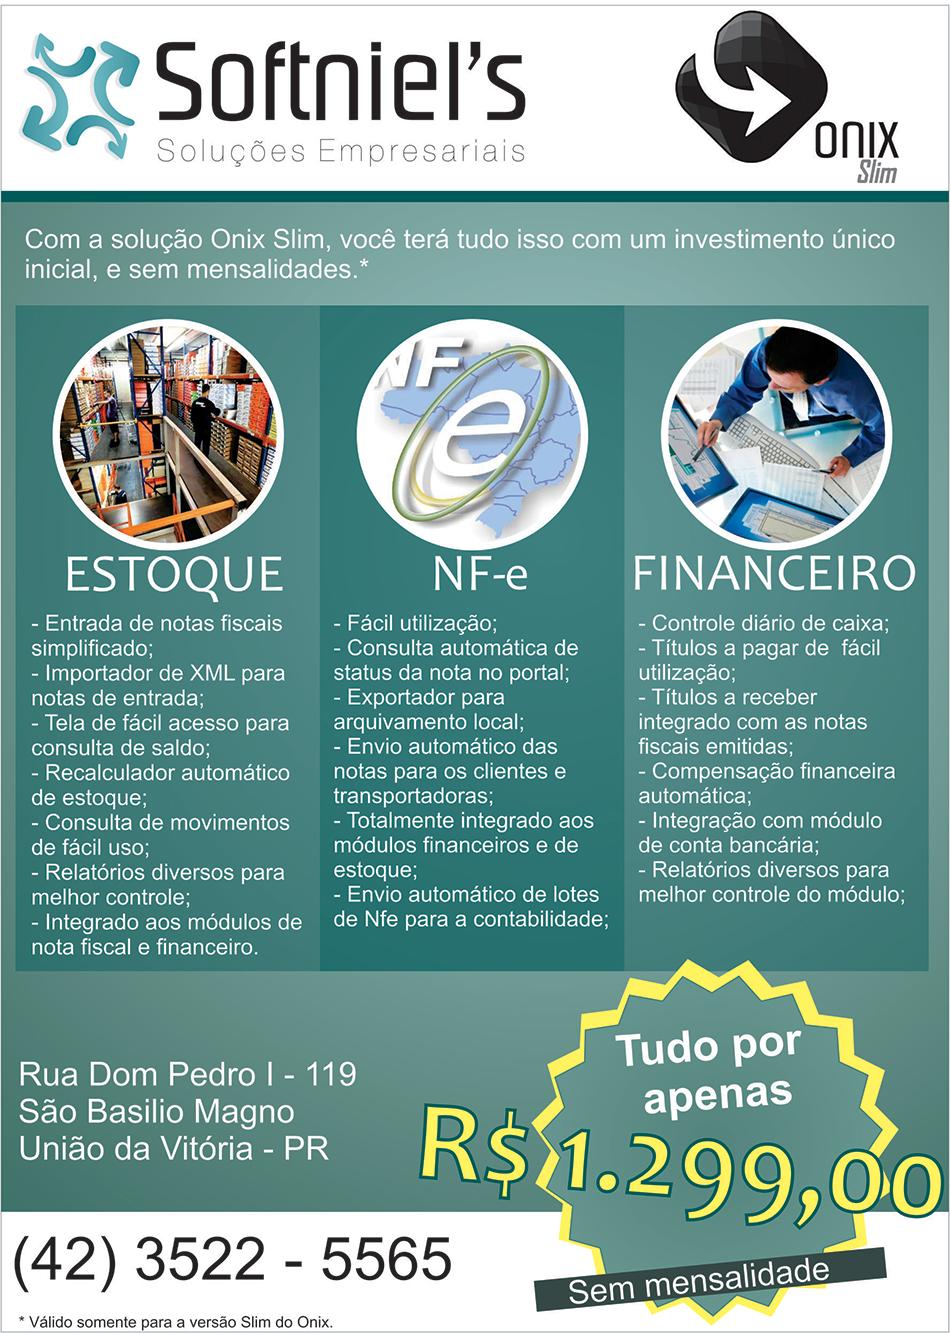 onix-slim-softniels-software-gestao-empresarial-sem-mensalidade